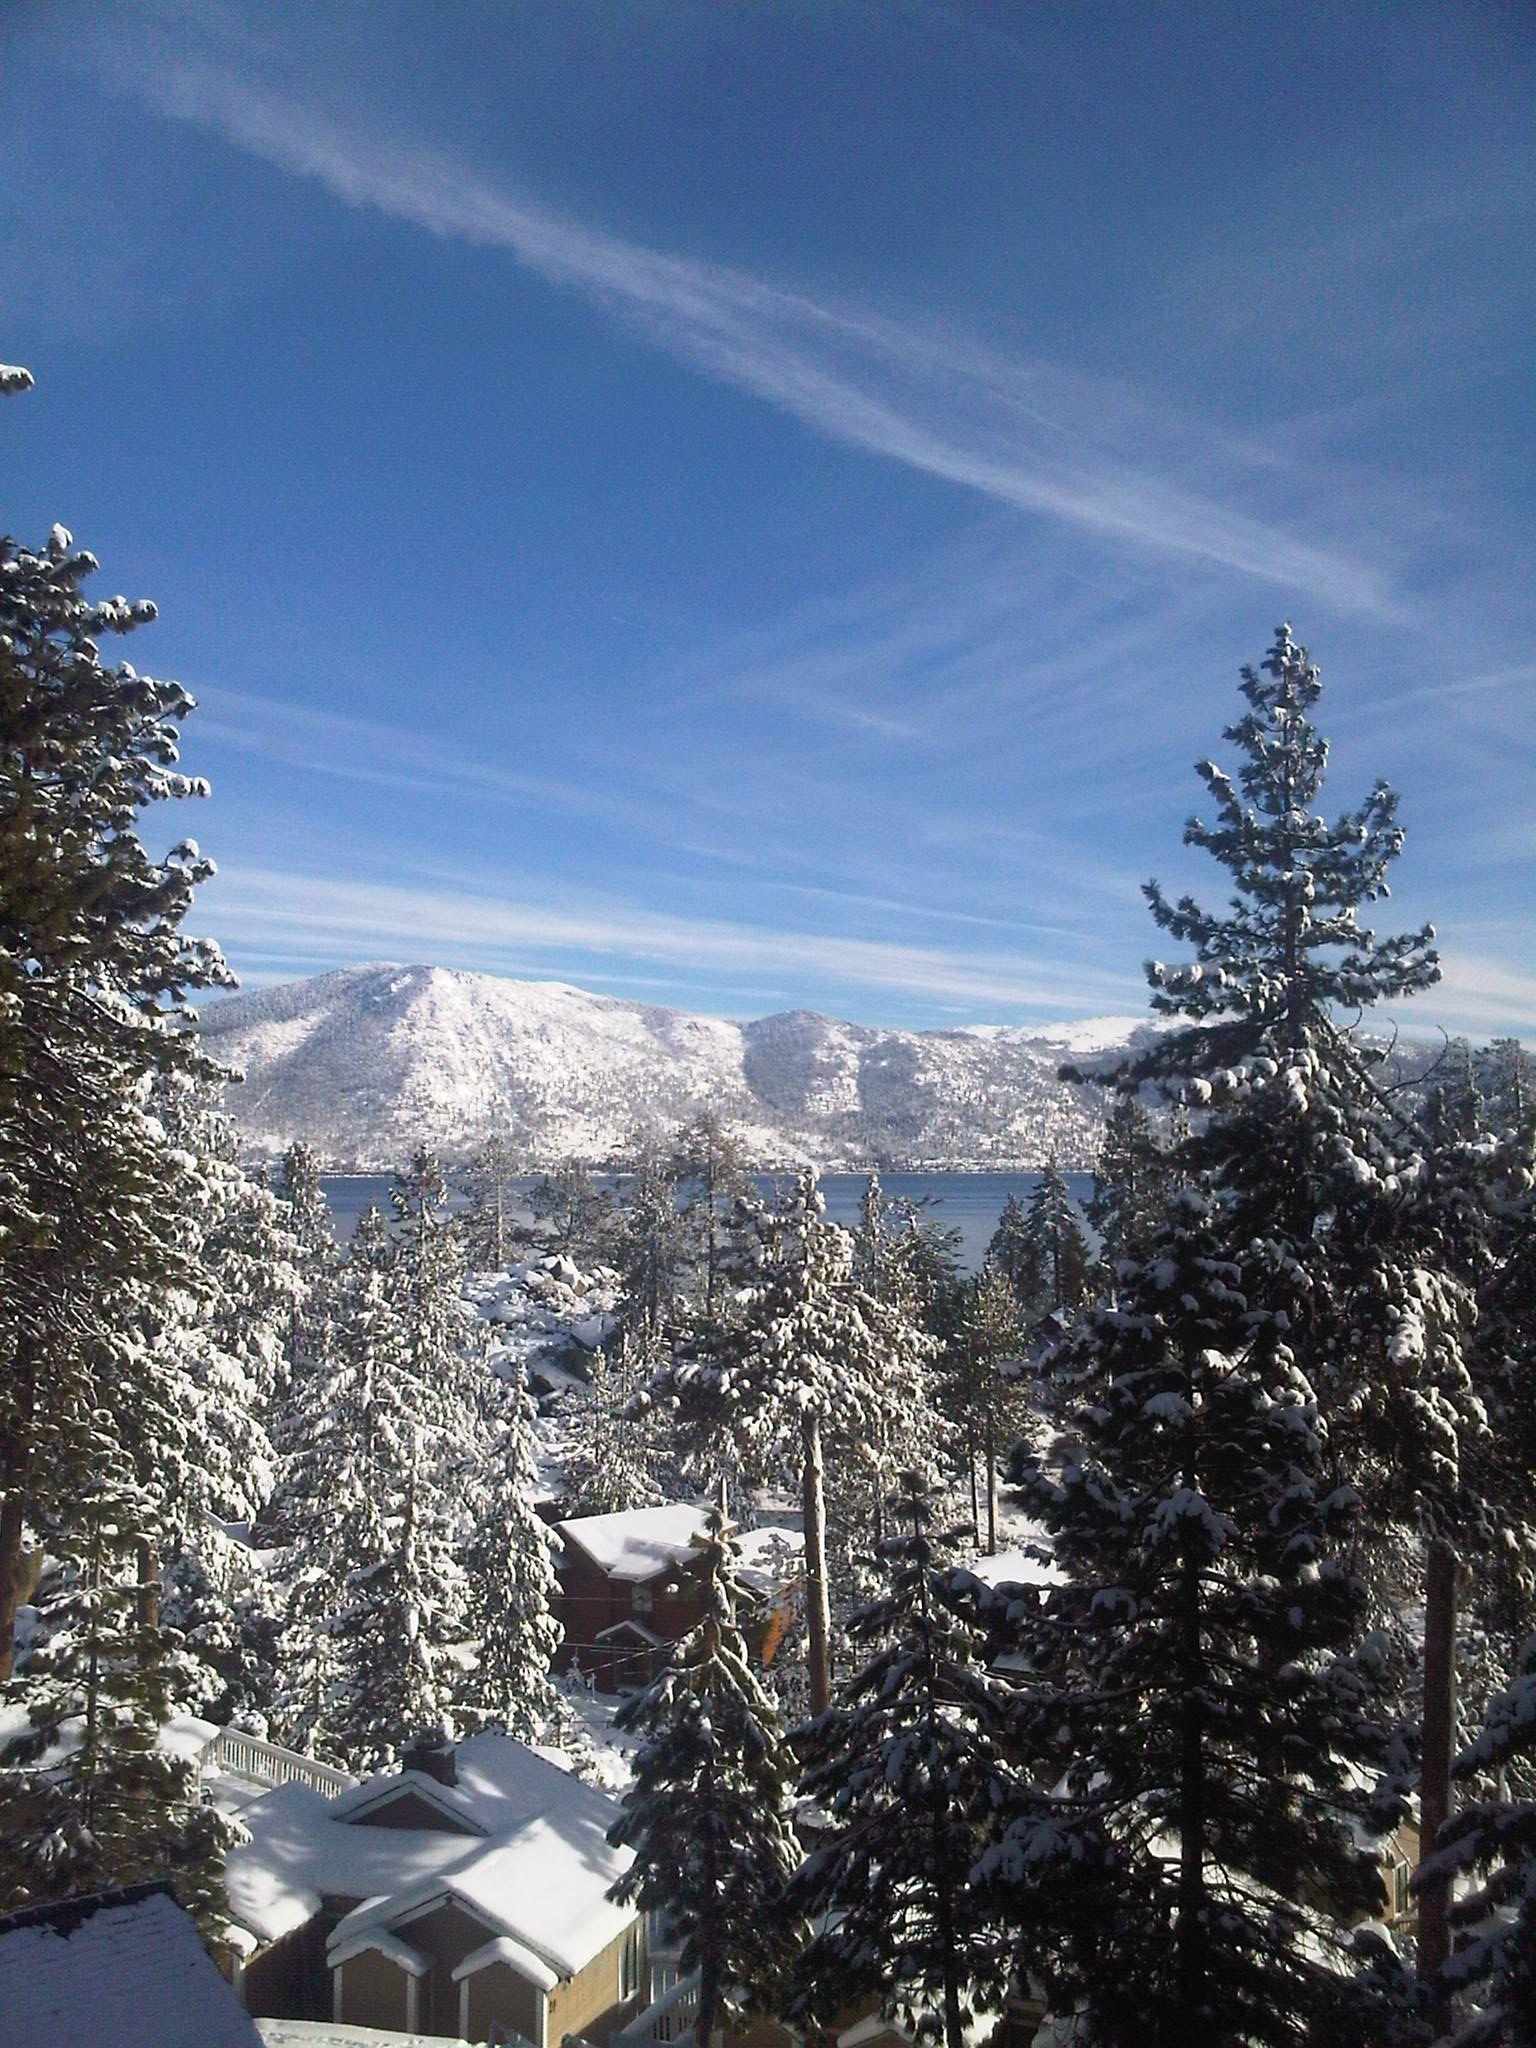 Lake Tahoe Winter Wallpaper Desktop Background: Favorite Places & Spaces